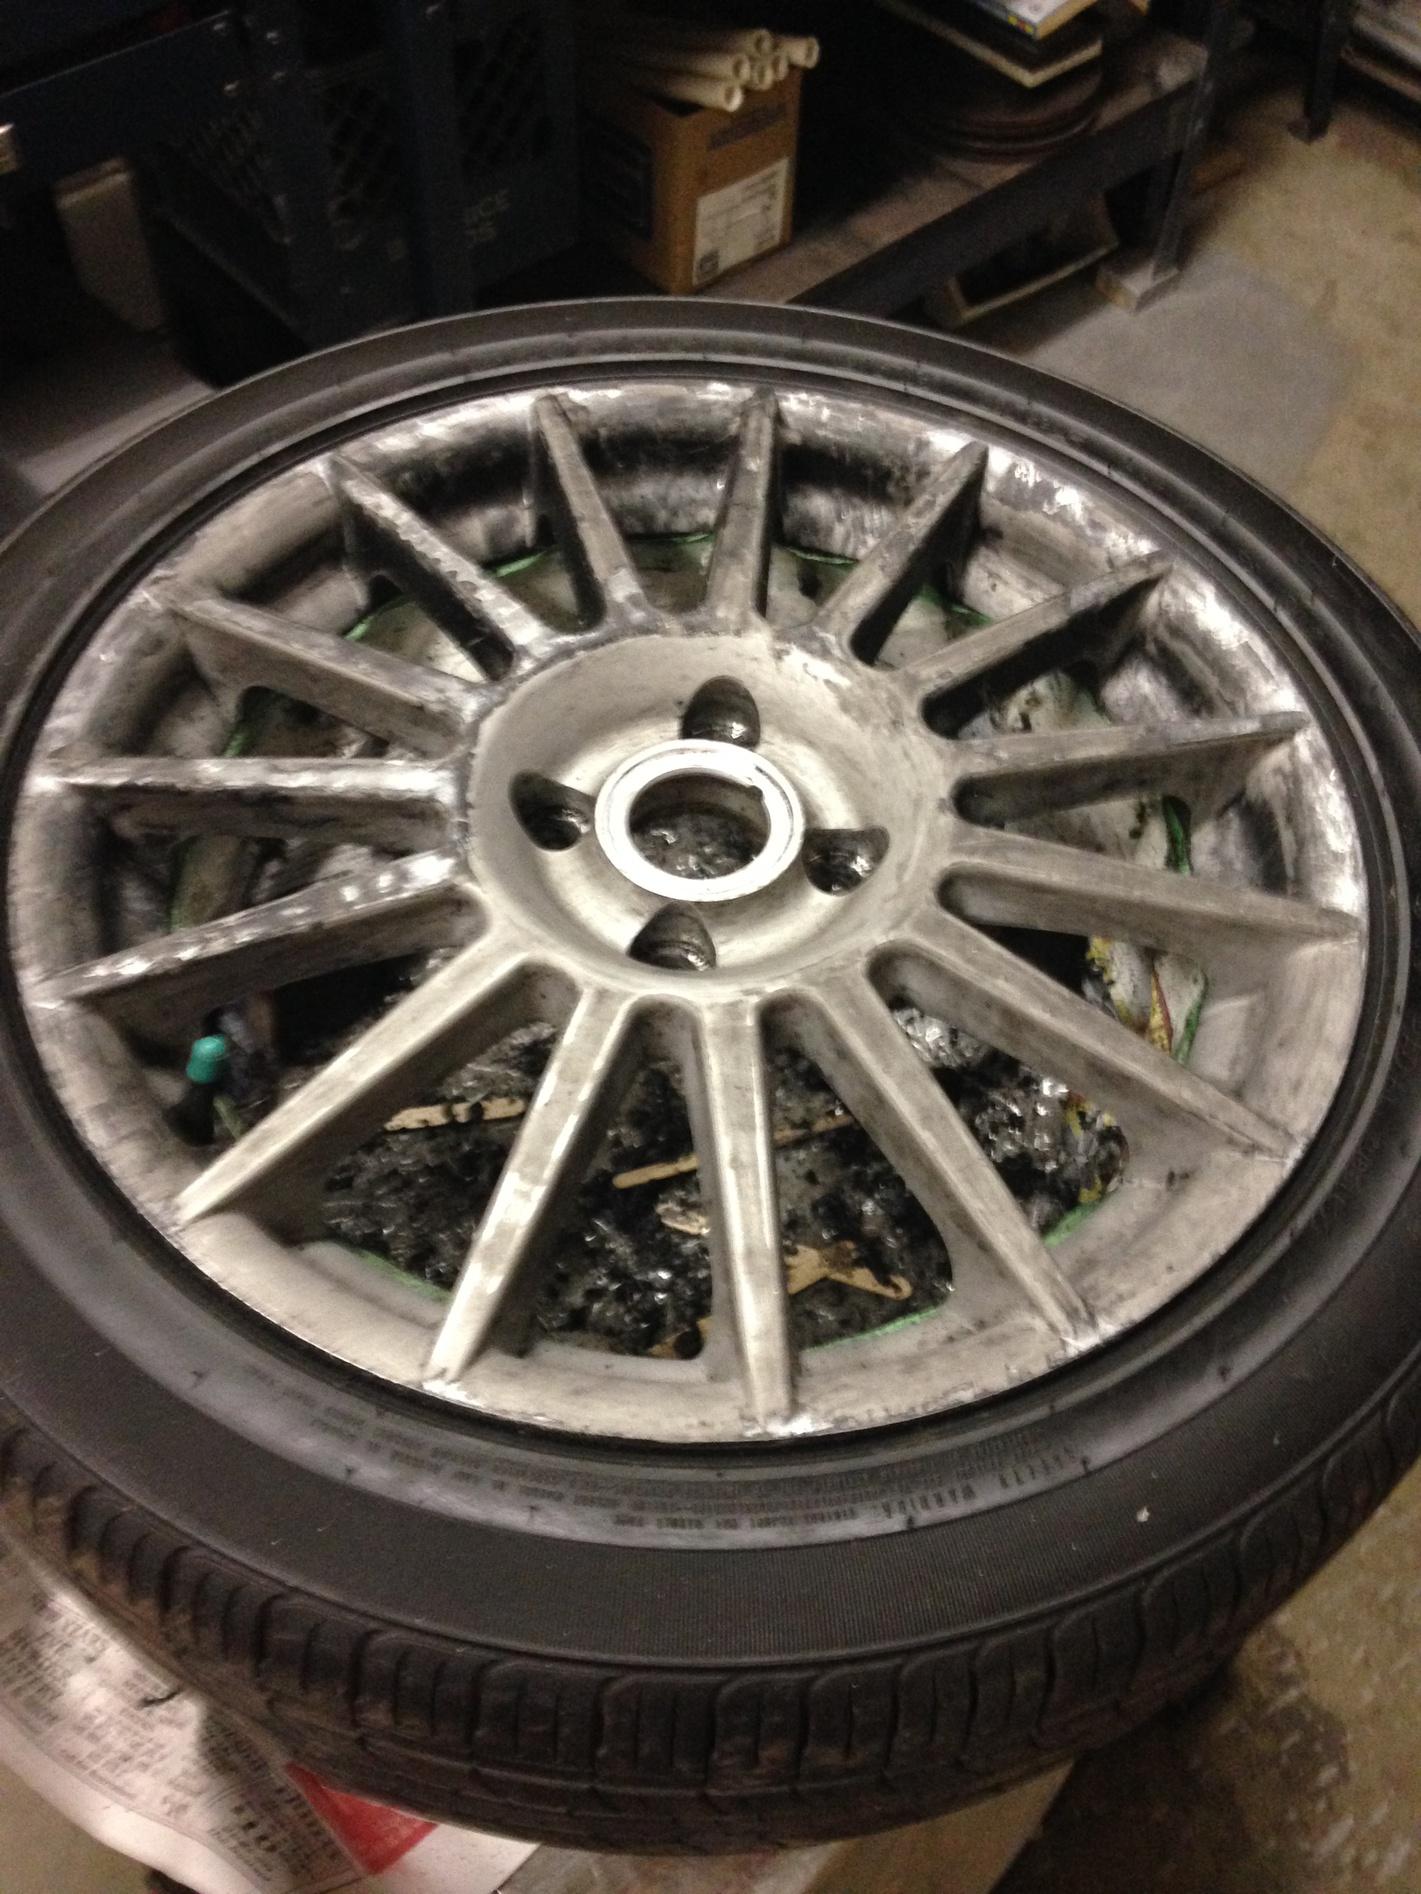 How To: Wheel / Rim Painting (Very Detailed)-001.jpg